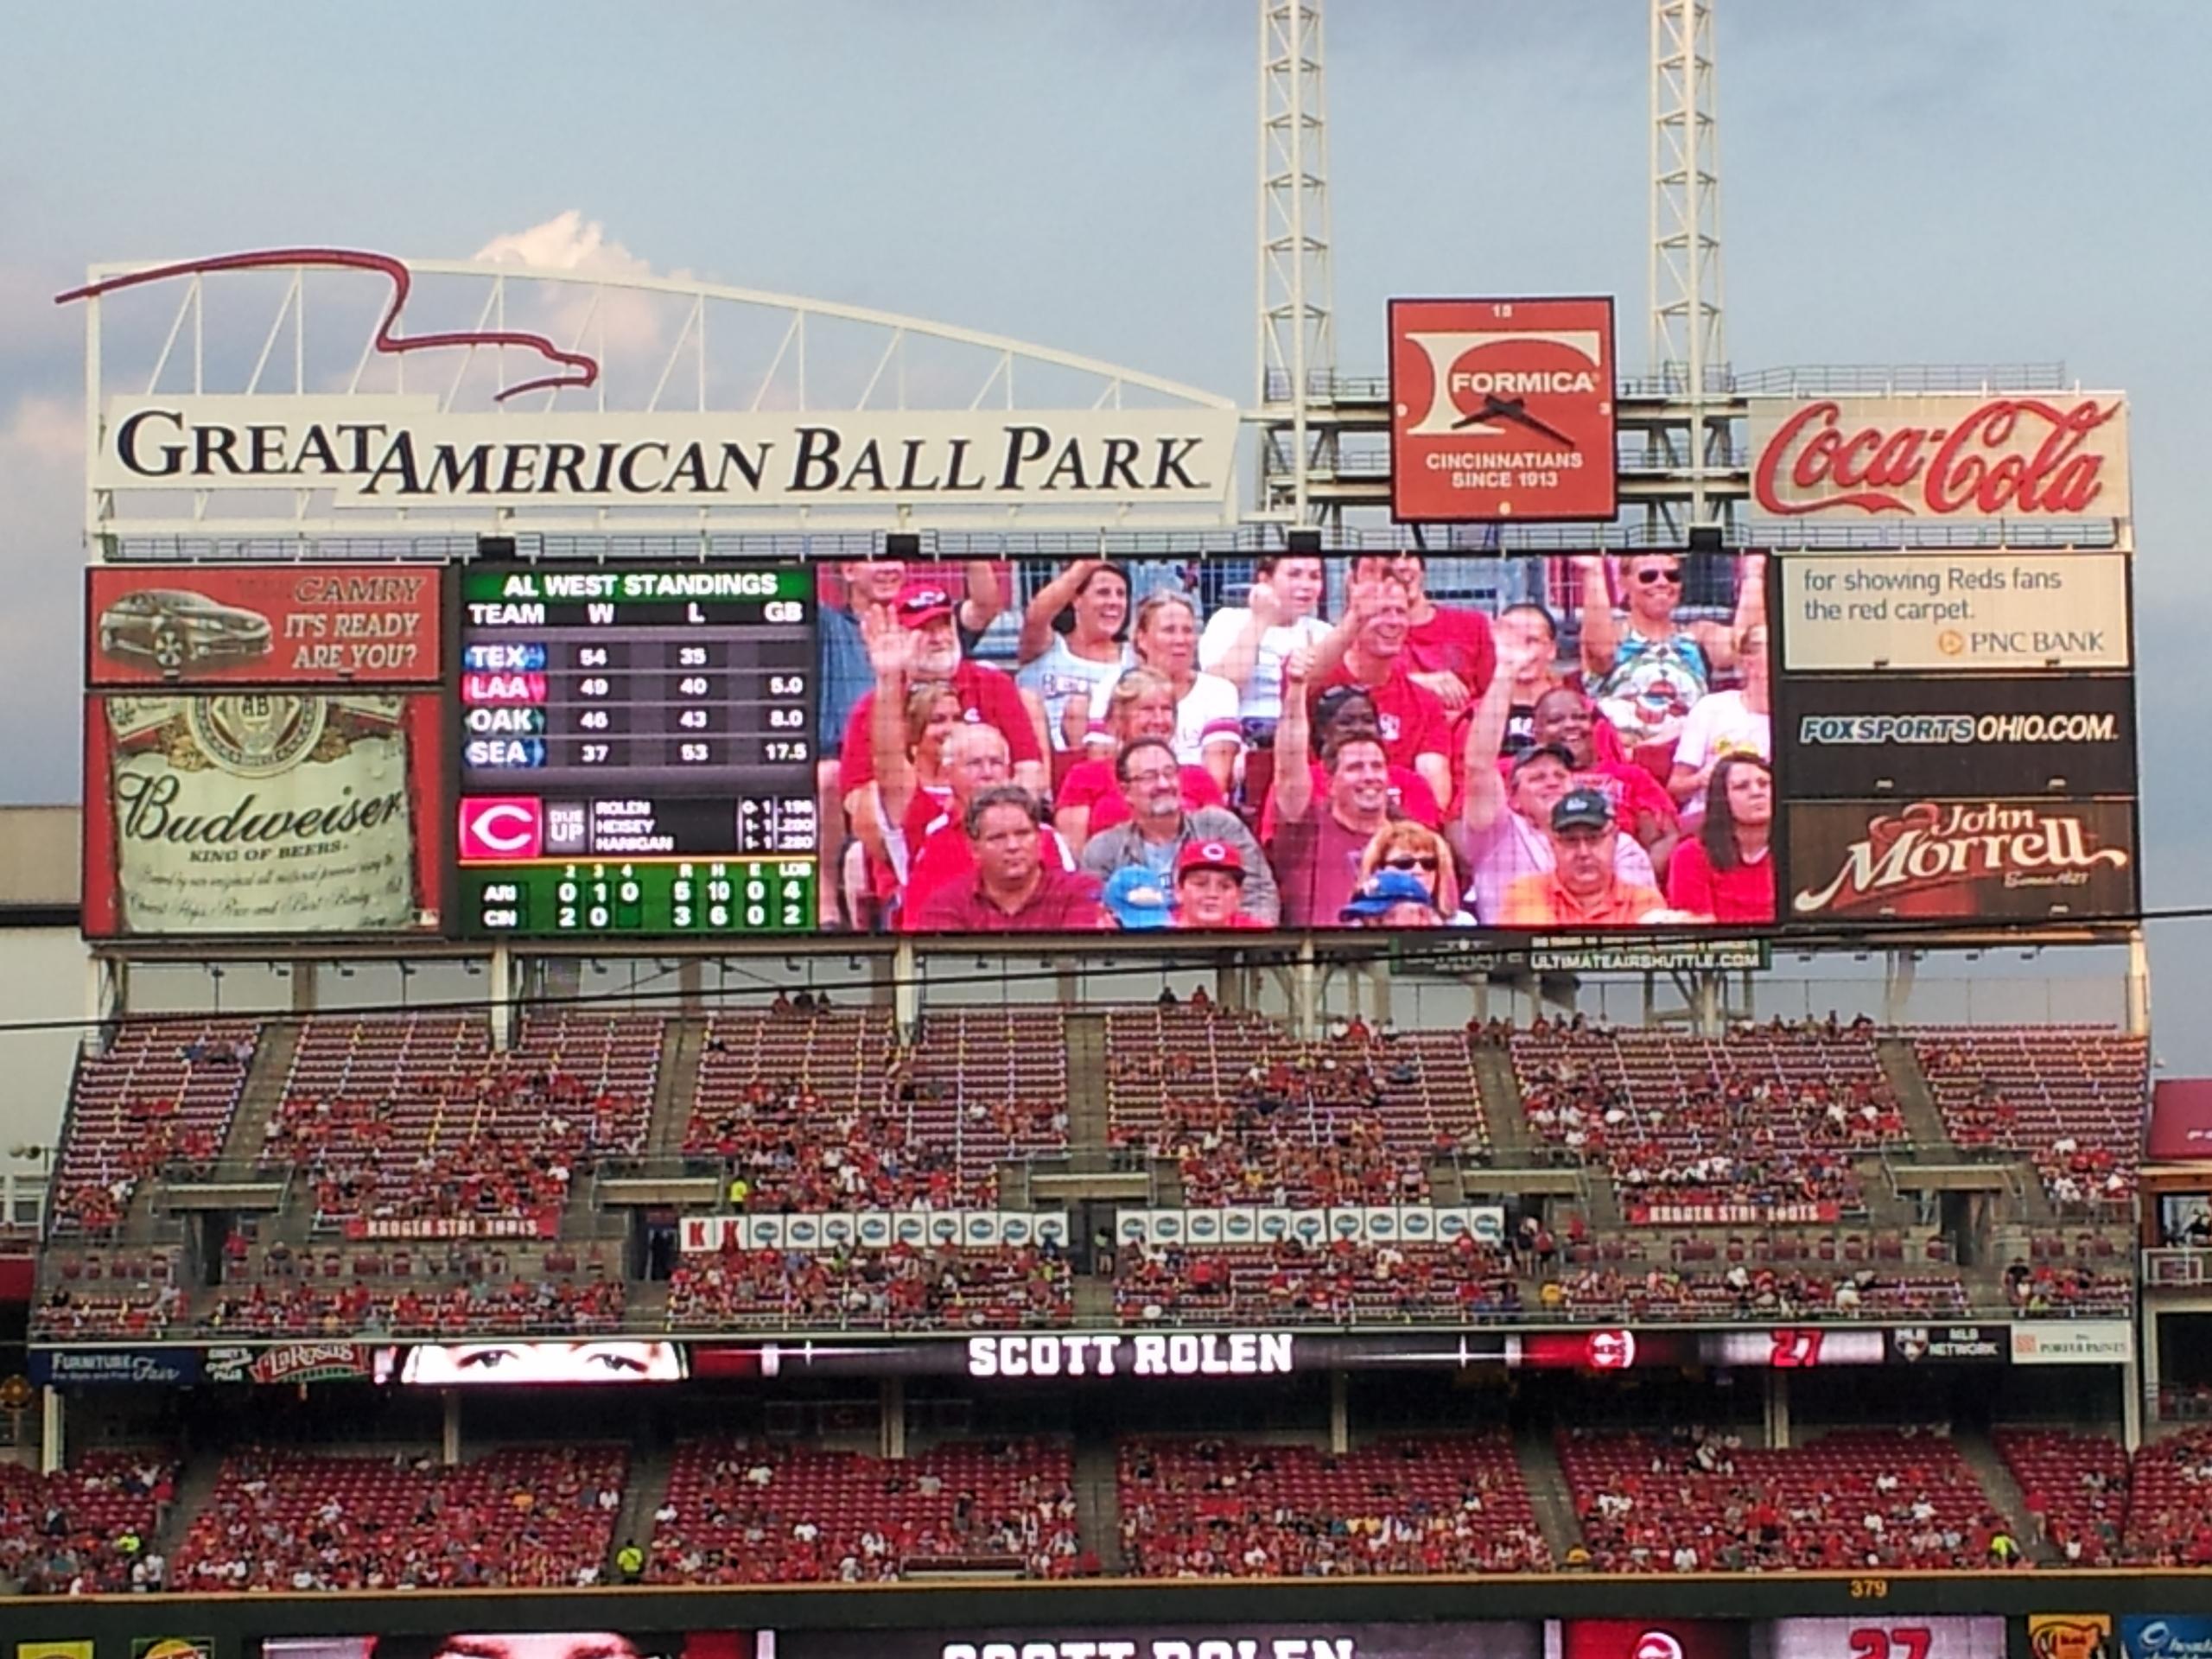 Cincinnati Reds Images Scoreboard HD Wallpaper And Background Photos